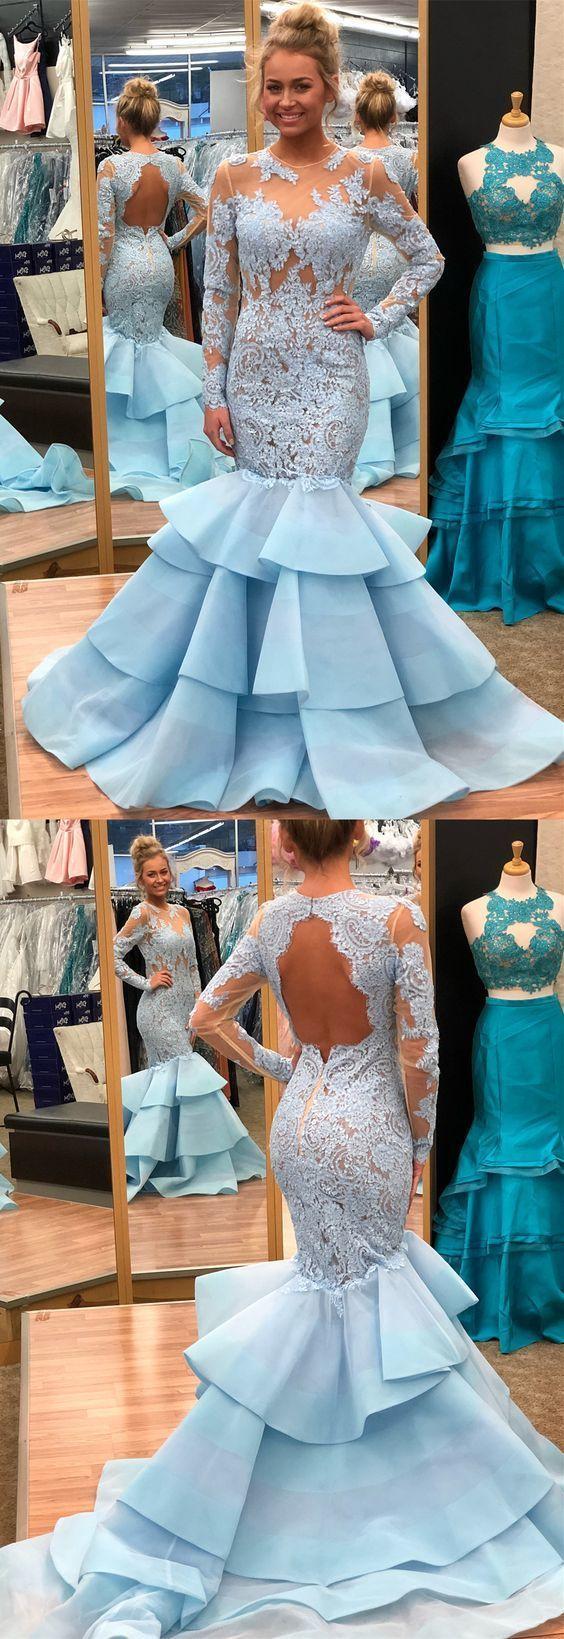 Elegant long sleeves mermaid blue long prom dress with open back in